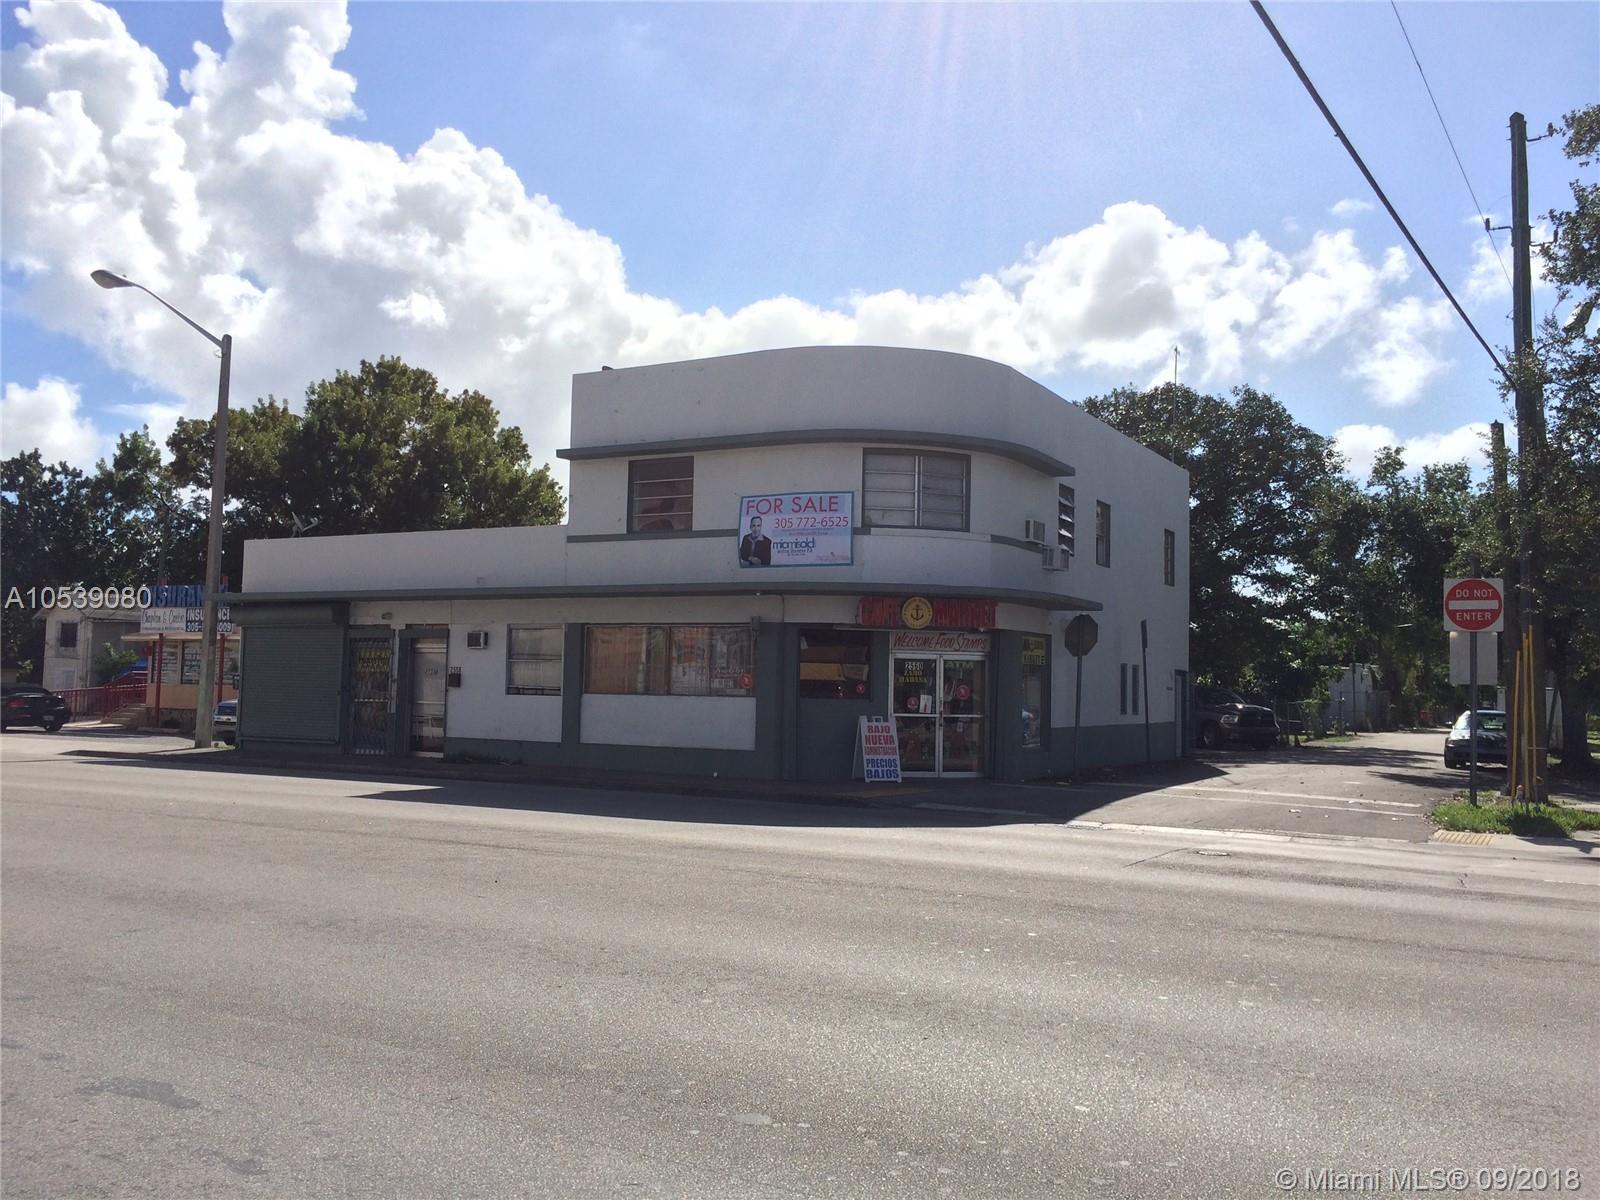 2560 NW 7 ST, Miami, FL 33125